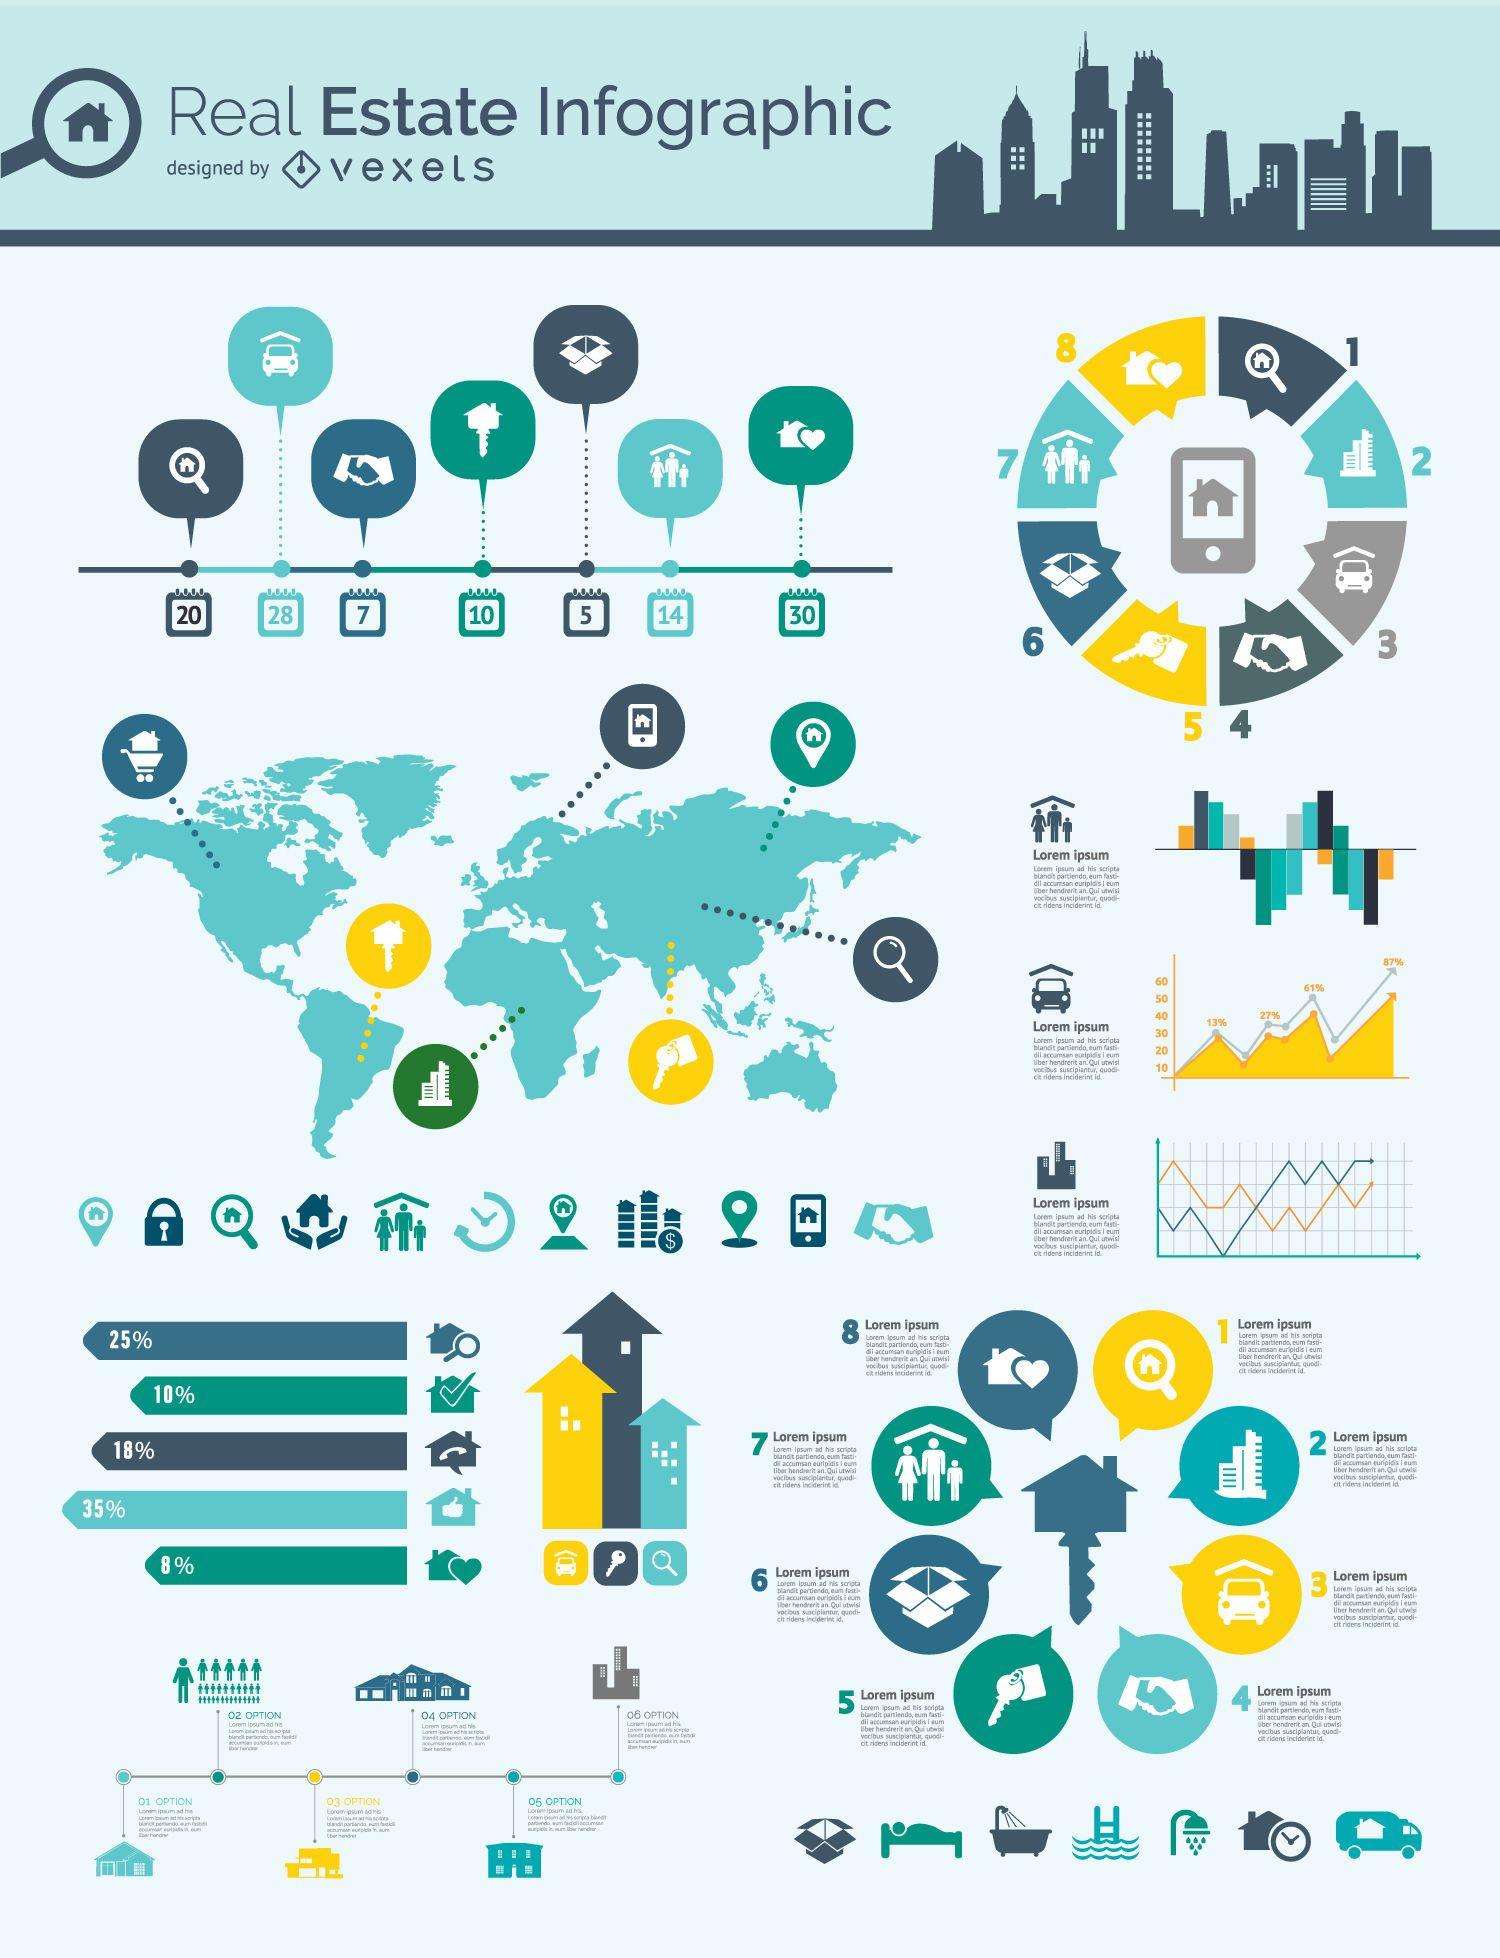 Inmobiliario mapa mental infografía - Descargar vector